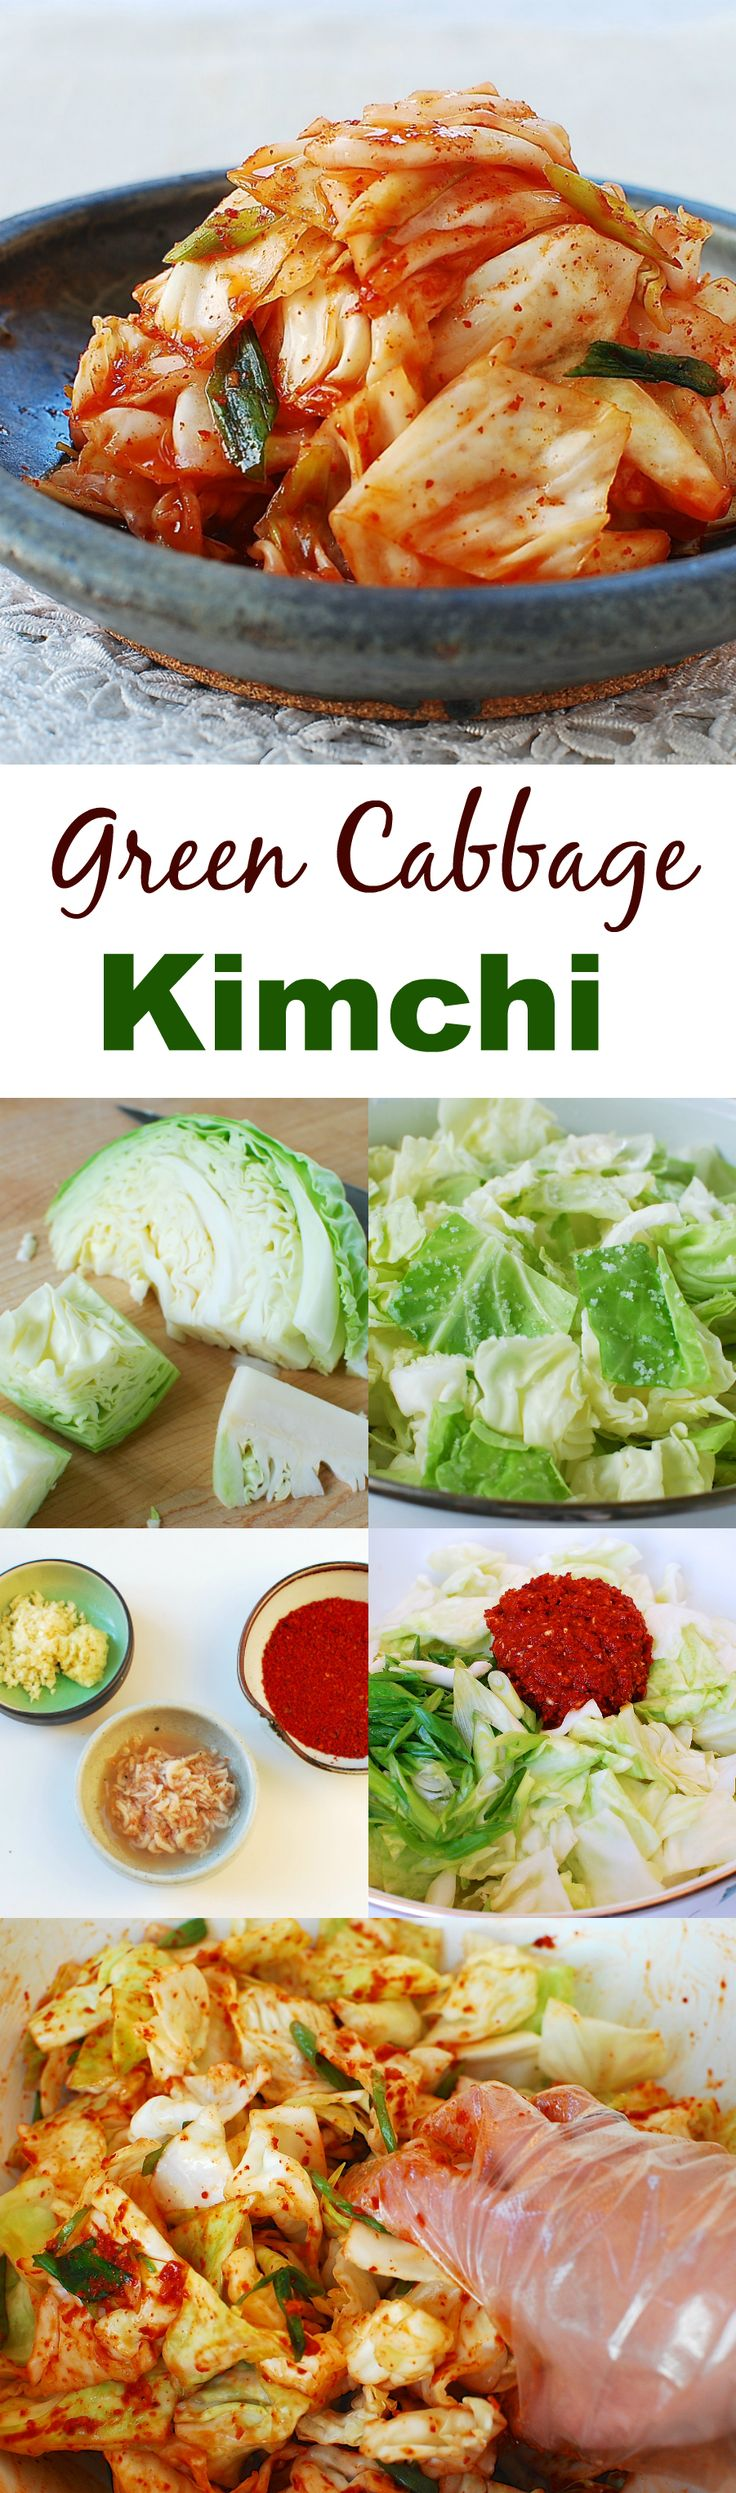 Yangbaechu kimchi - Easy kimchi made with green cabbage!